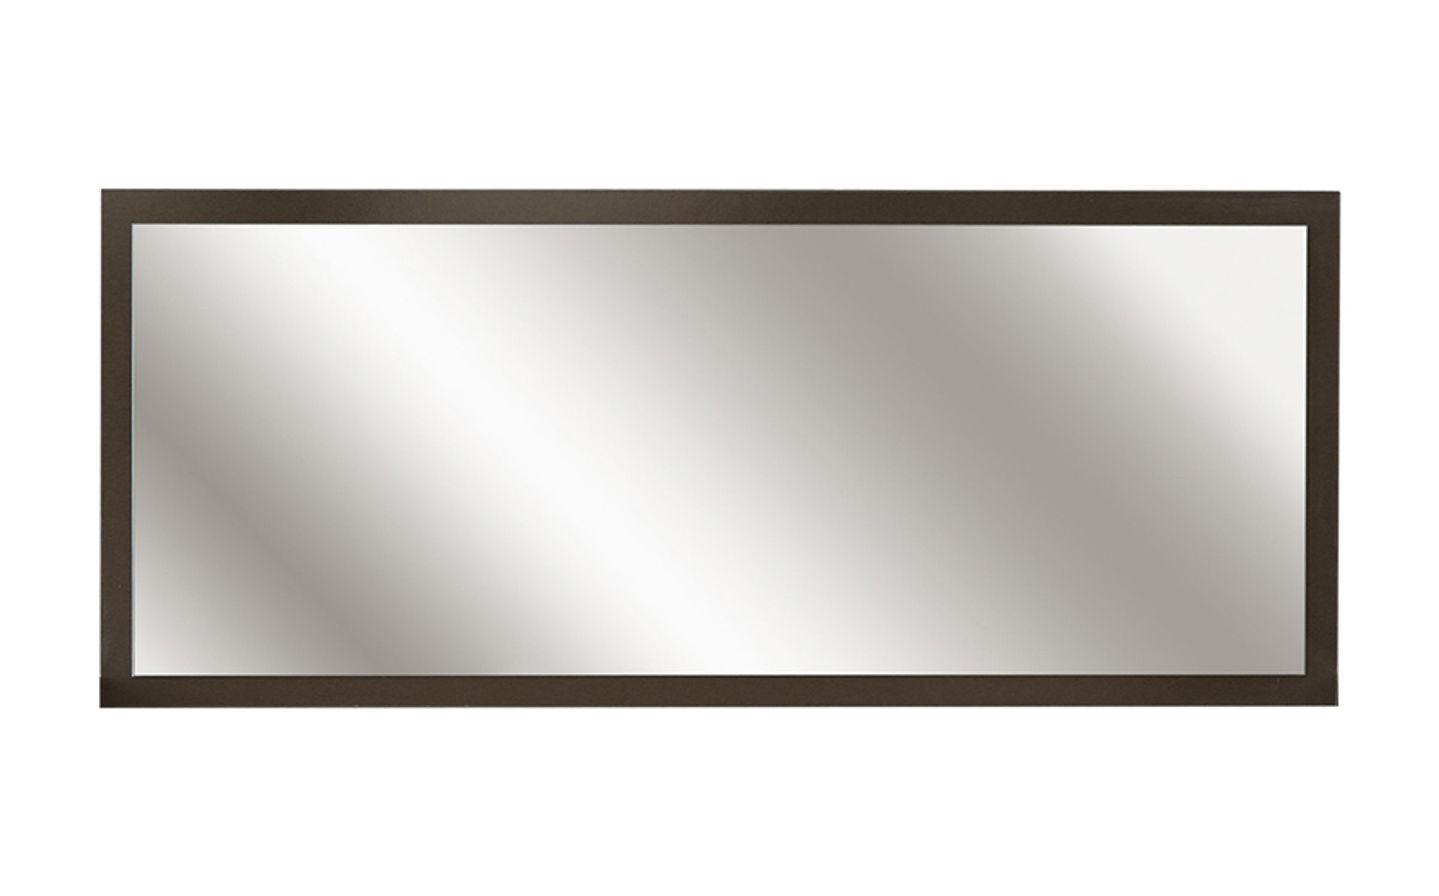 Metropalitan Şifonyer Ayna